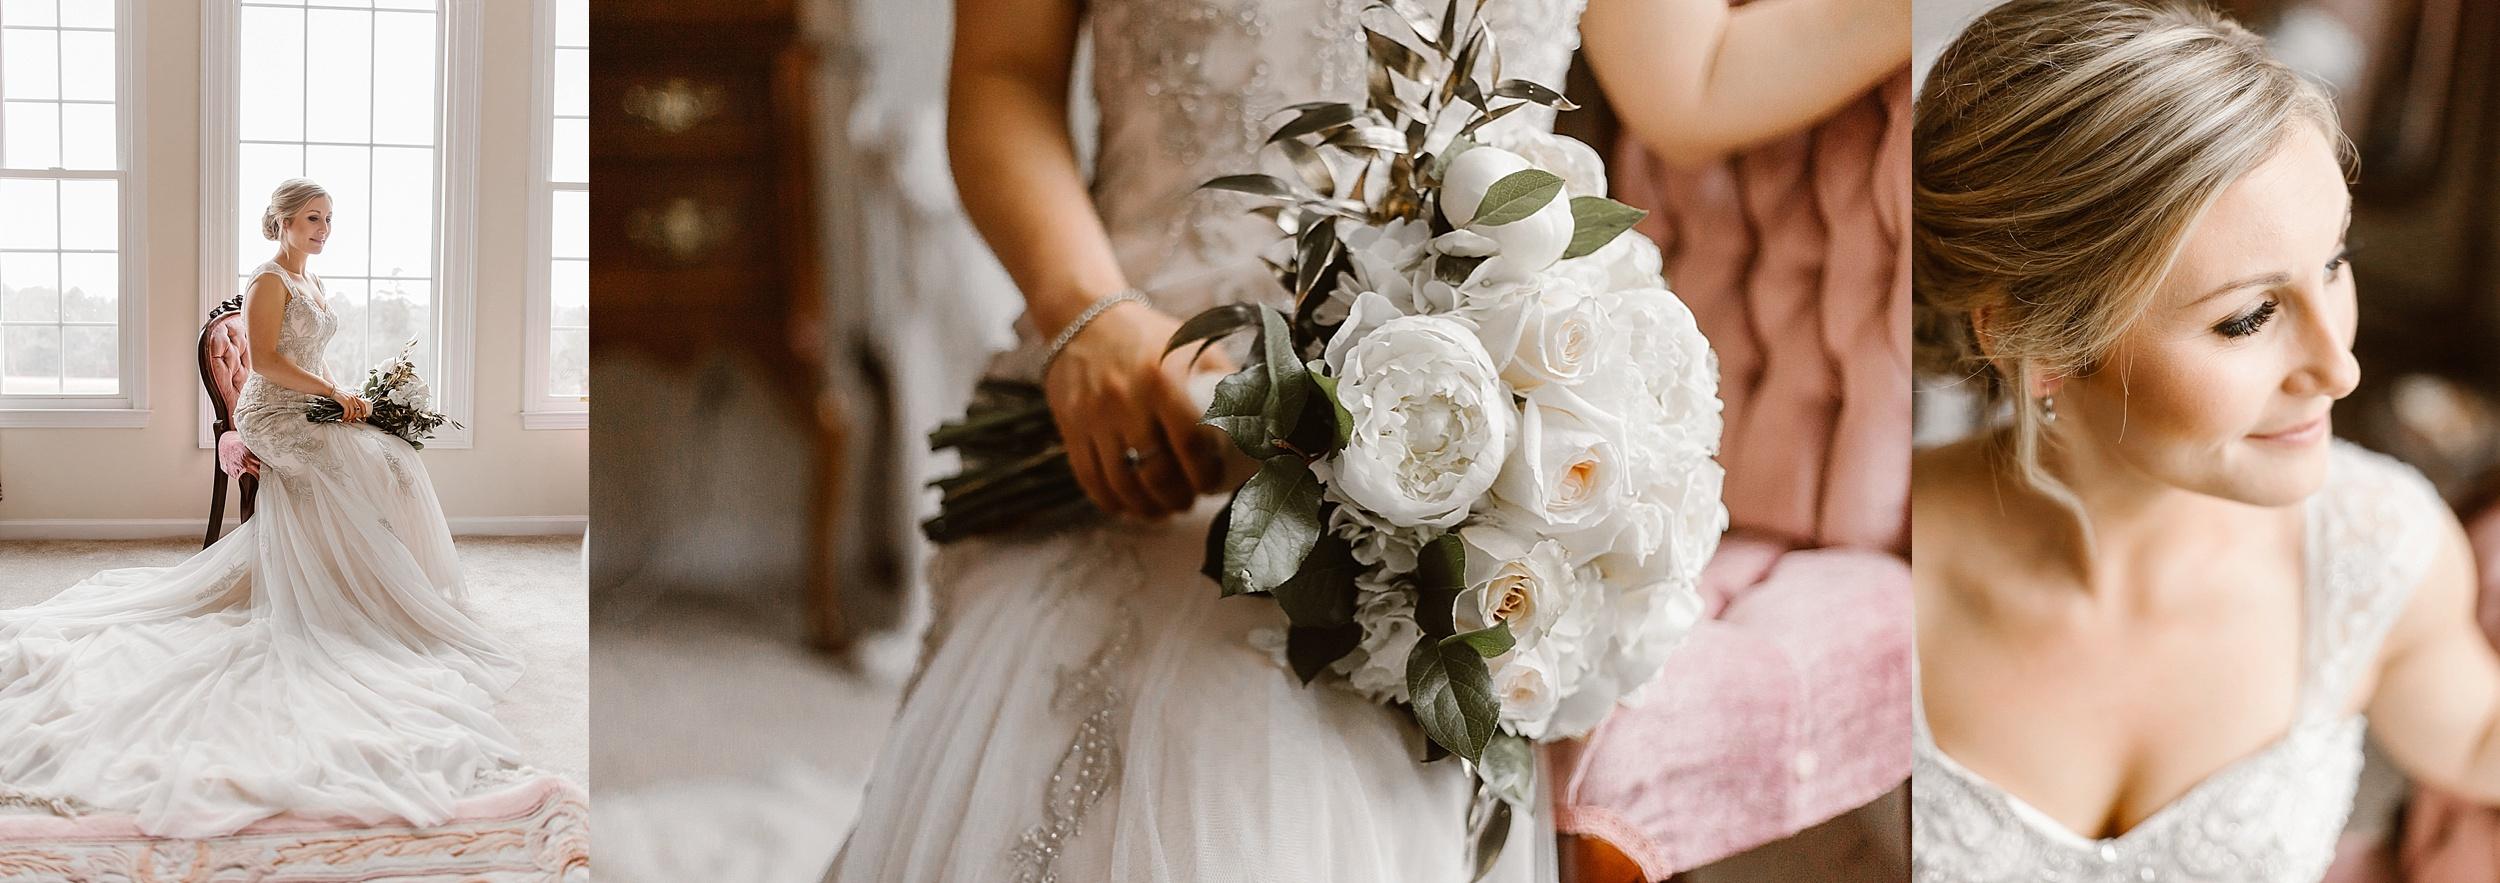 knoxville-wedding-bride-2